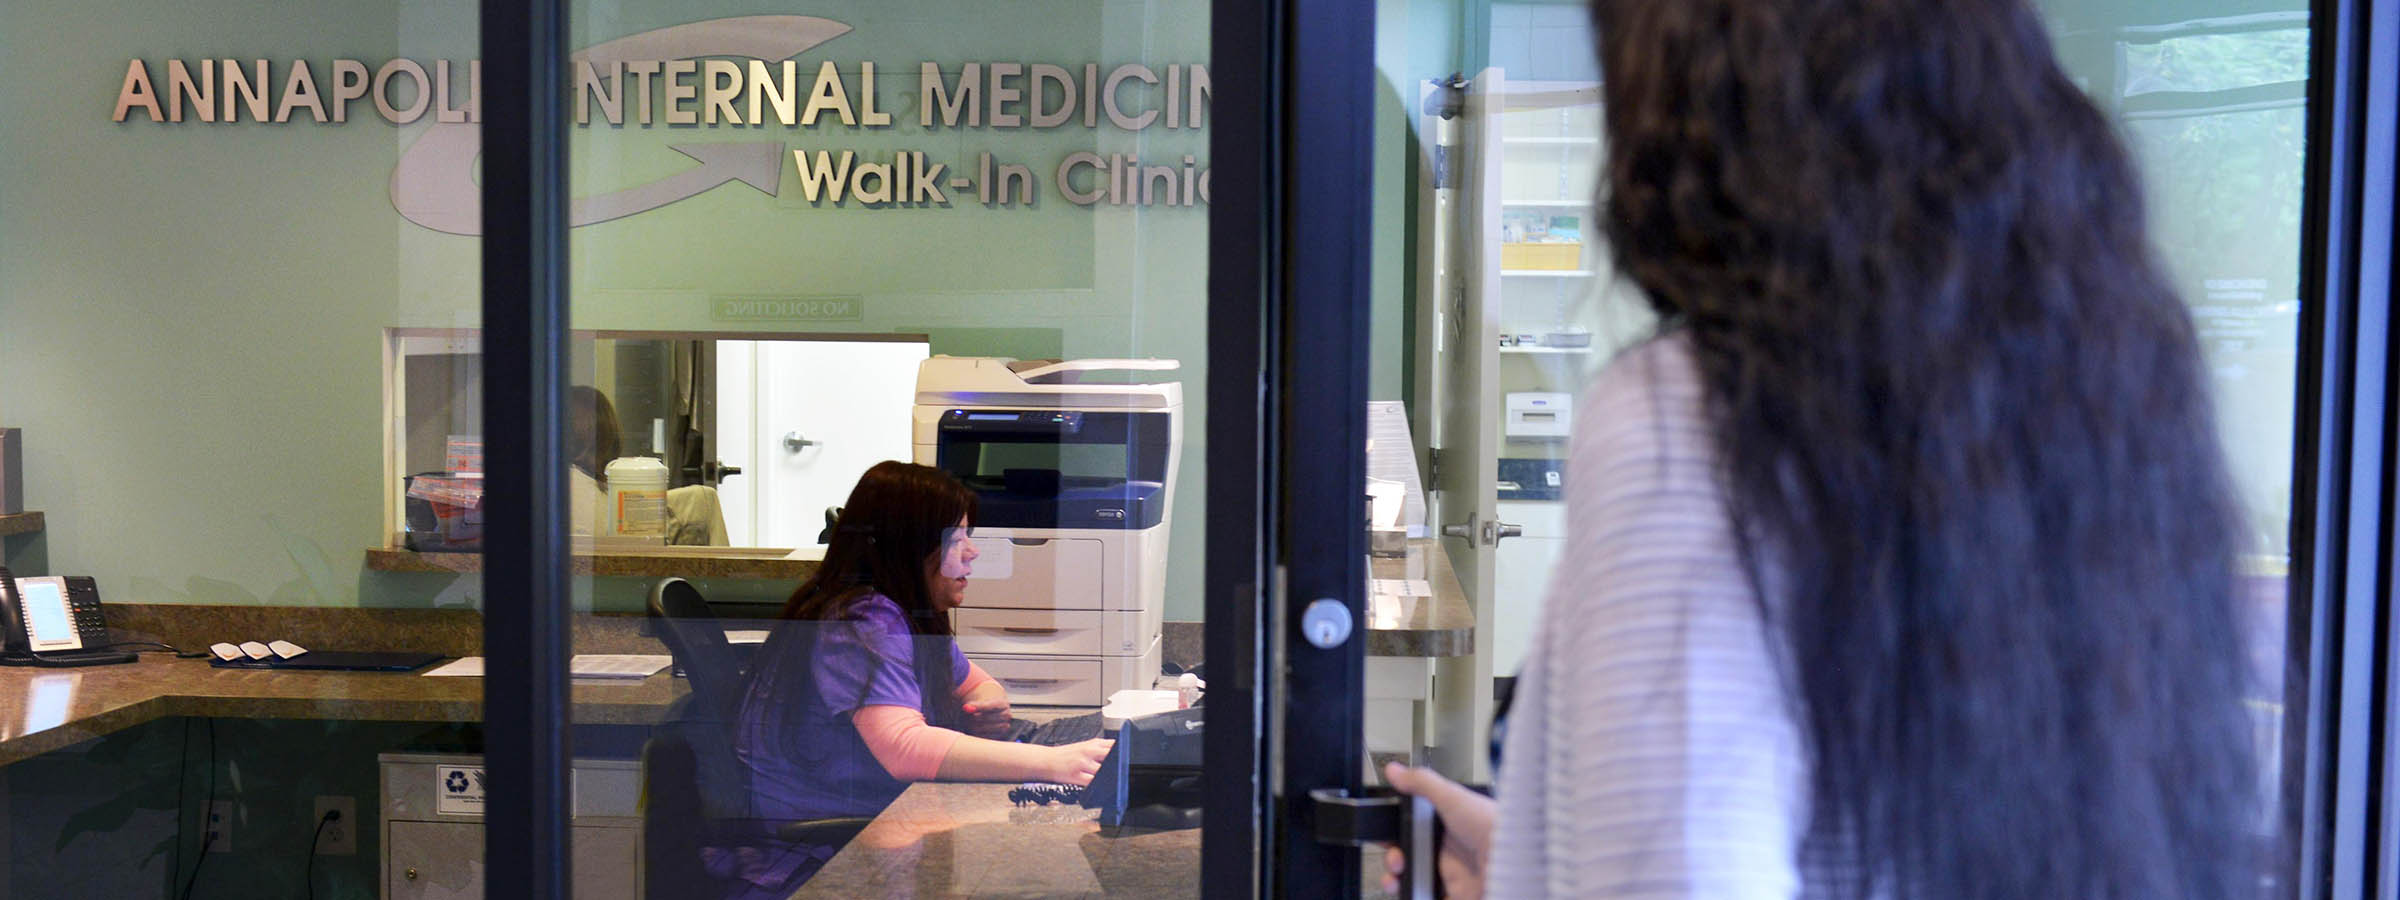 0417_3-Min Case_Walk-In Clinic_HEADER.jpg